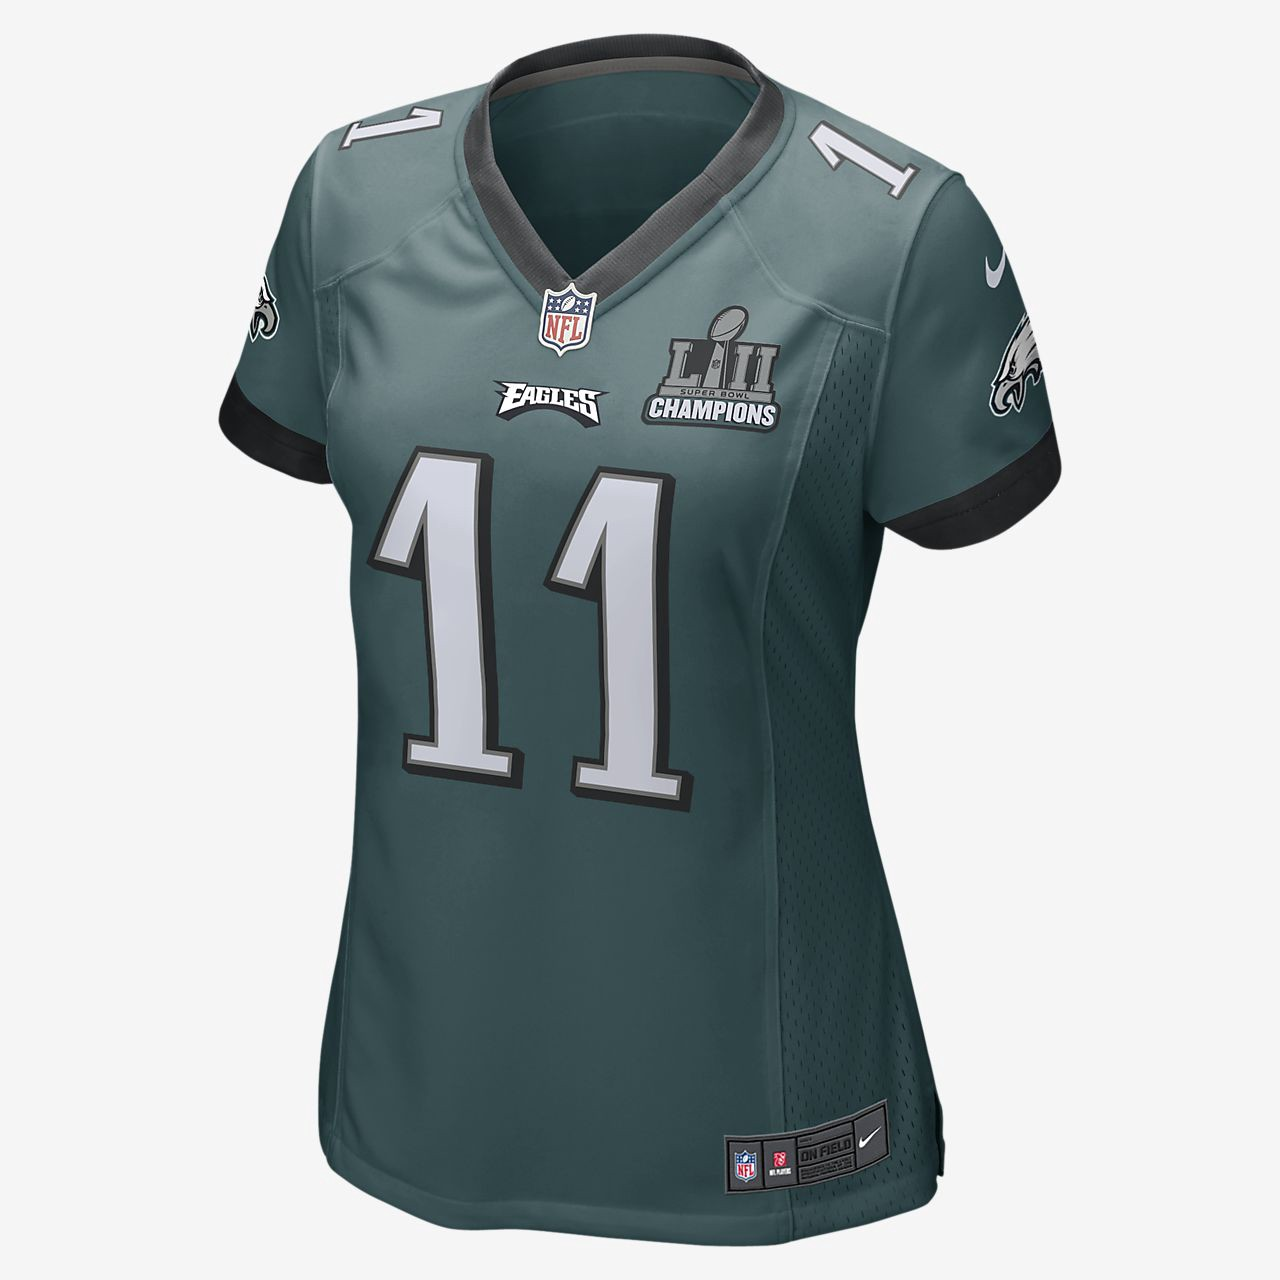 a1a38351d Nike Nfl Philadelphia Eagles Game Jersey (Carson Wentz) Women s Football -  2Xl (20